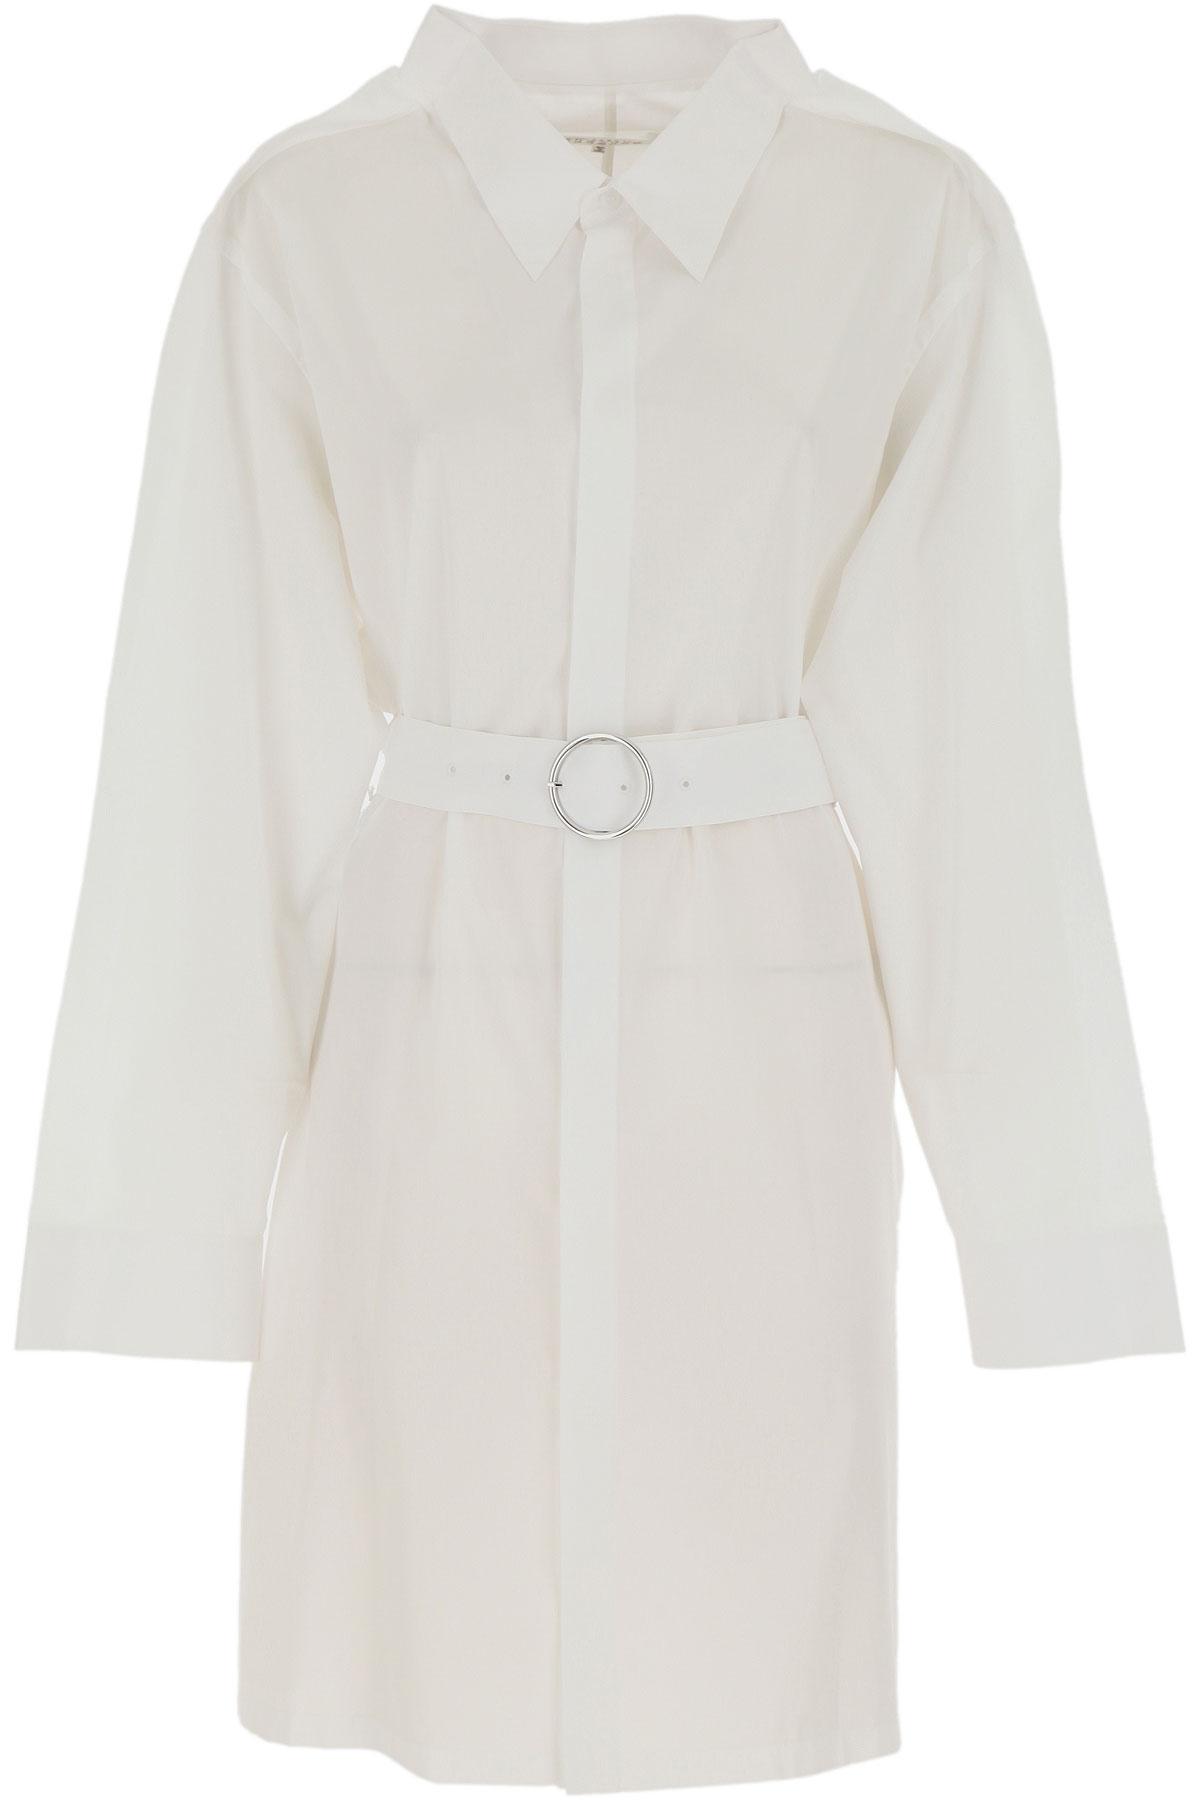 Maison Martin Margiela Dress for Women, Evening Cocktail Party On Sale, White, Cotton, 2019, 4 6